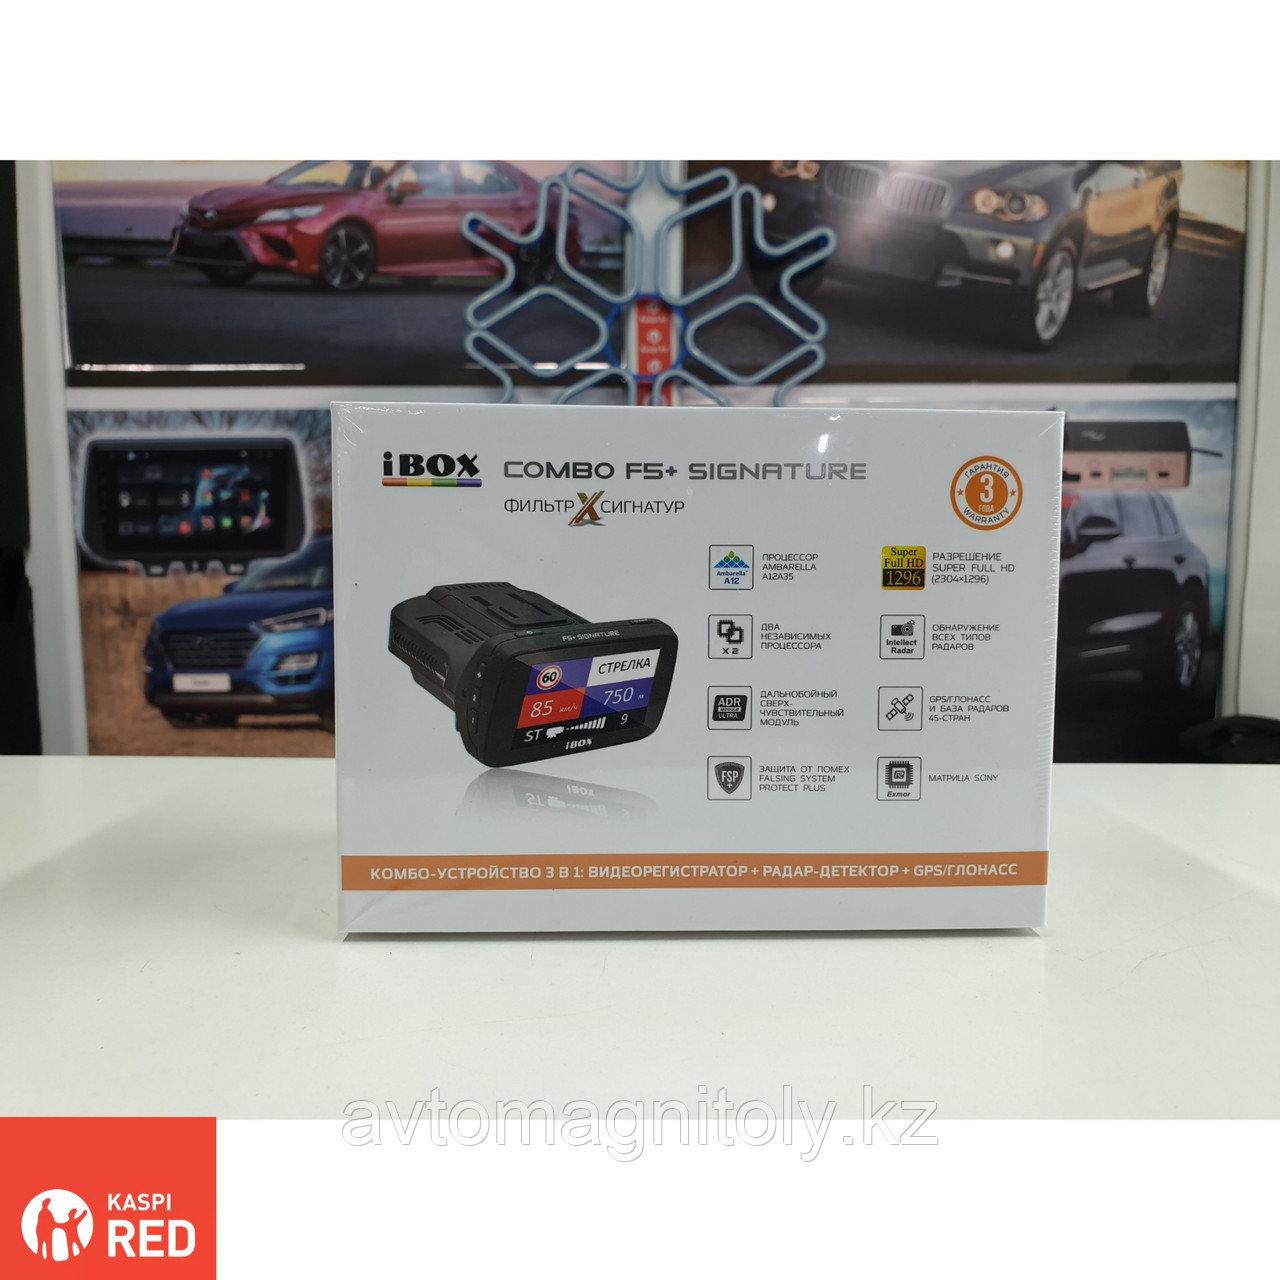 IBOX Combo F5+ (PLUS) SIGNATURE